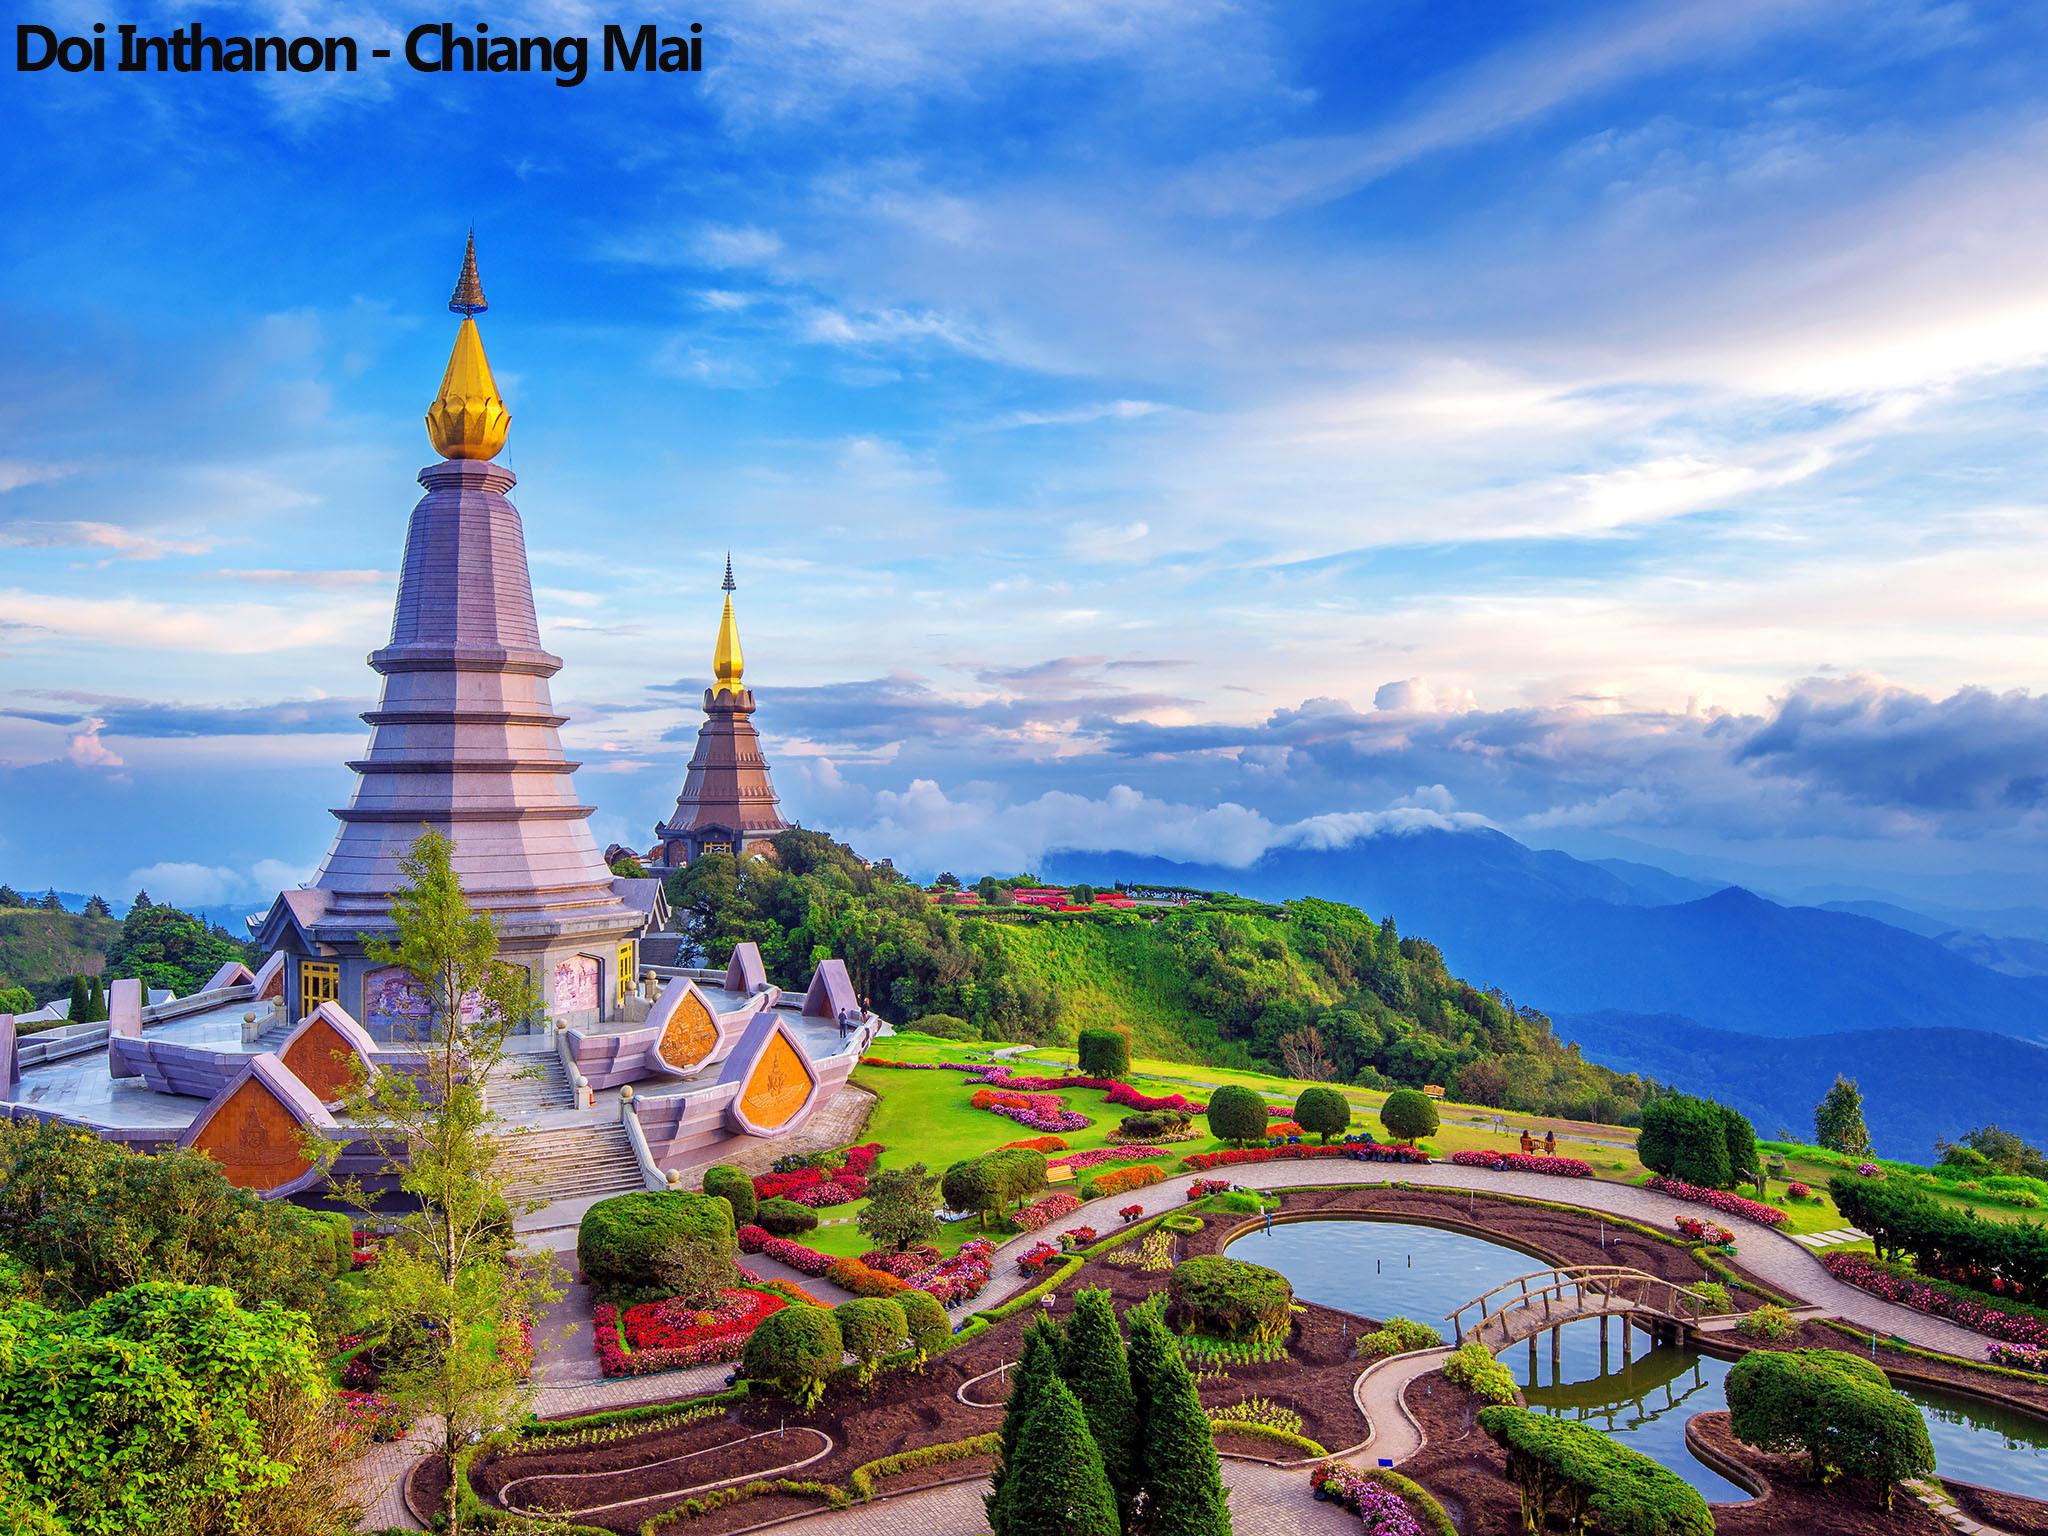 Norte da Tailândia 2019 & 2020